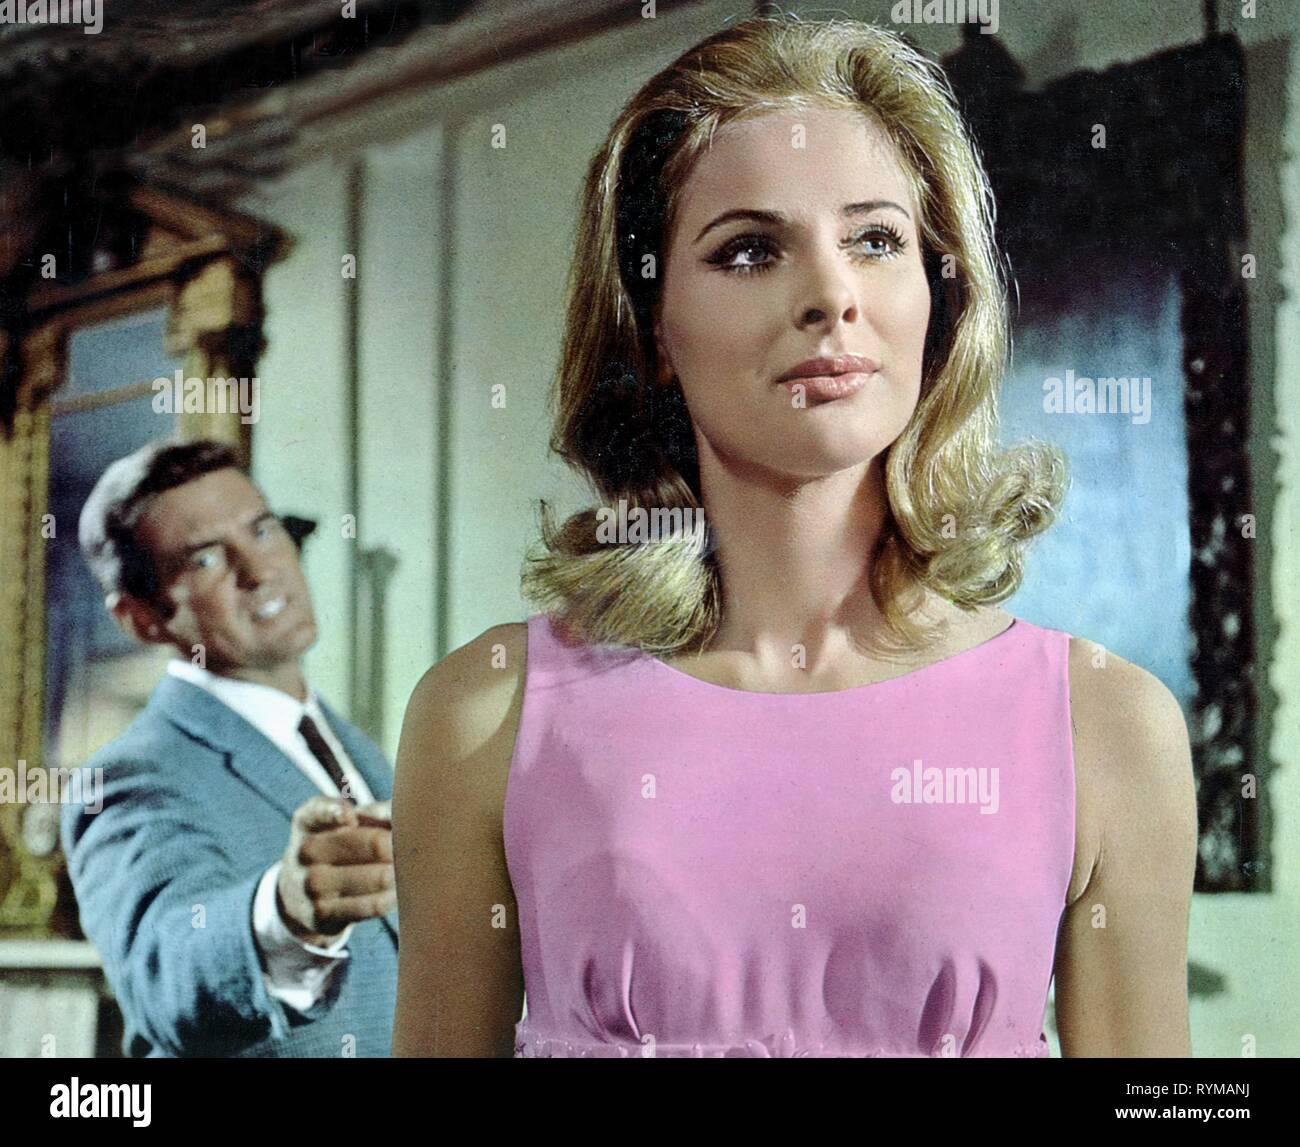 TAYLOR,SPARV, NOBODY RUNS FOREVER, 1968 - Stock Image